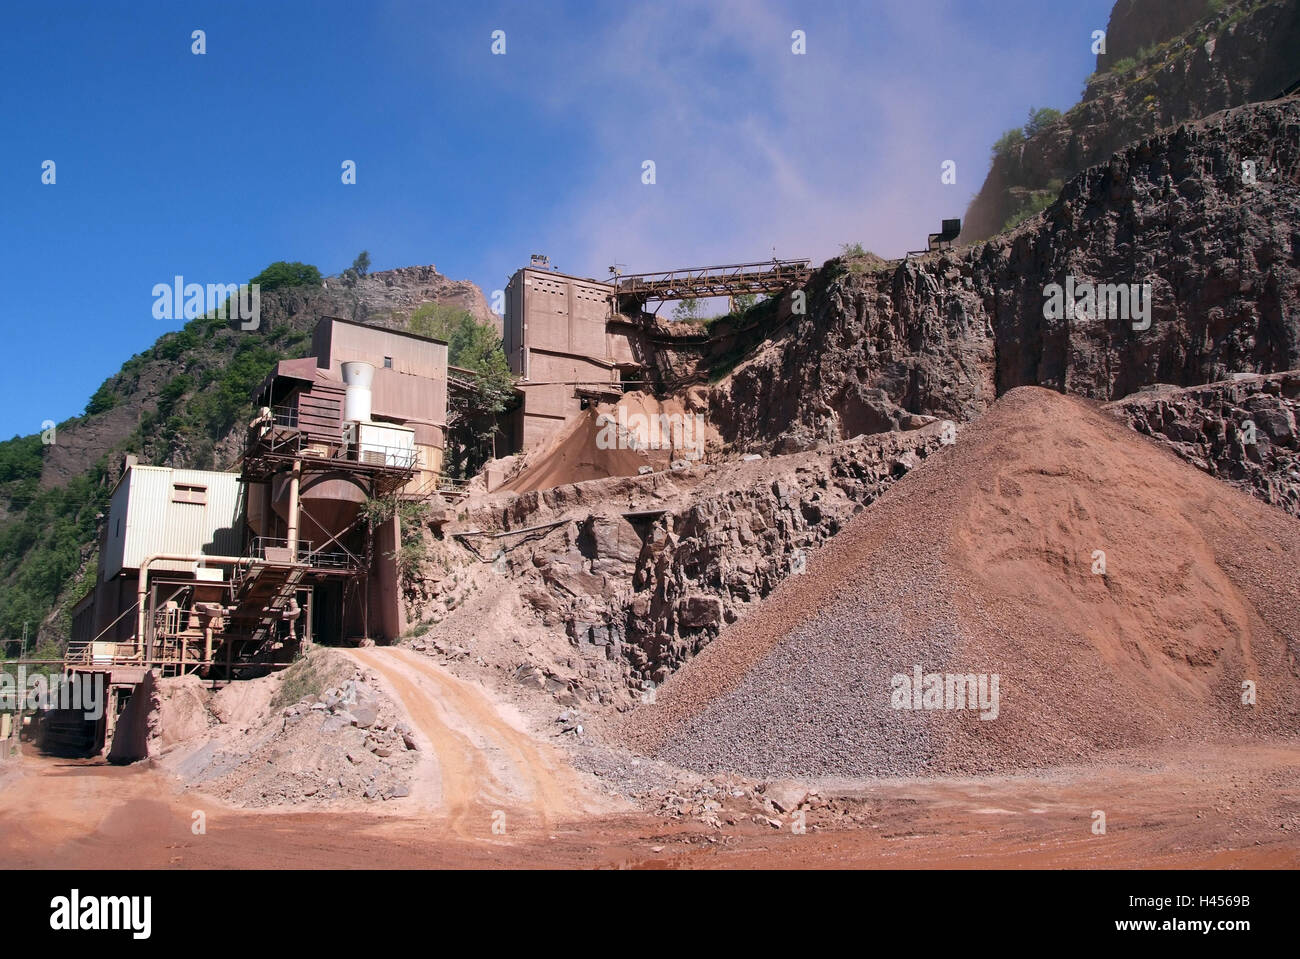 Quarry, crusher, - Stock Image